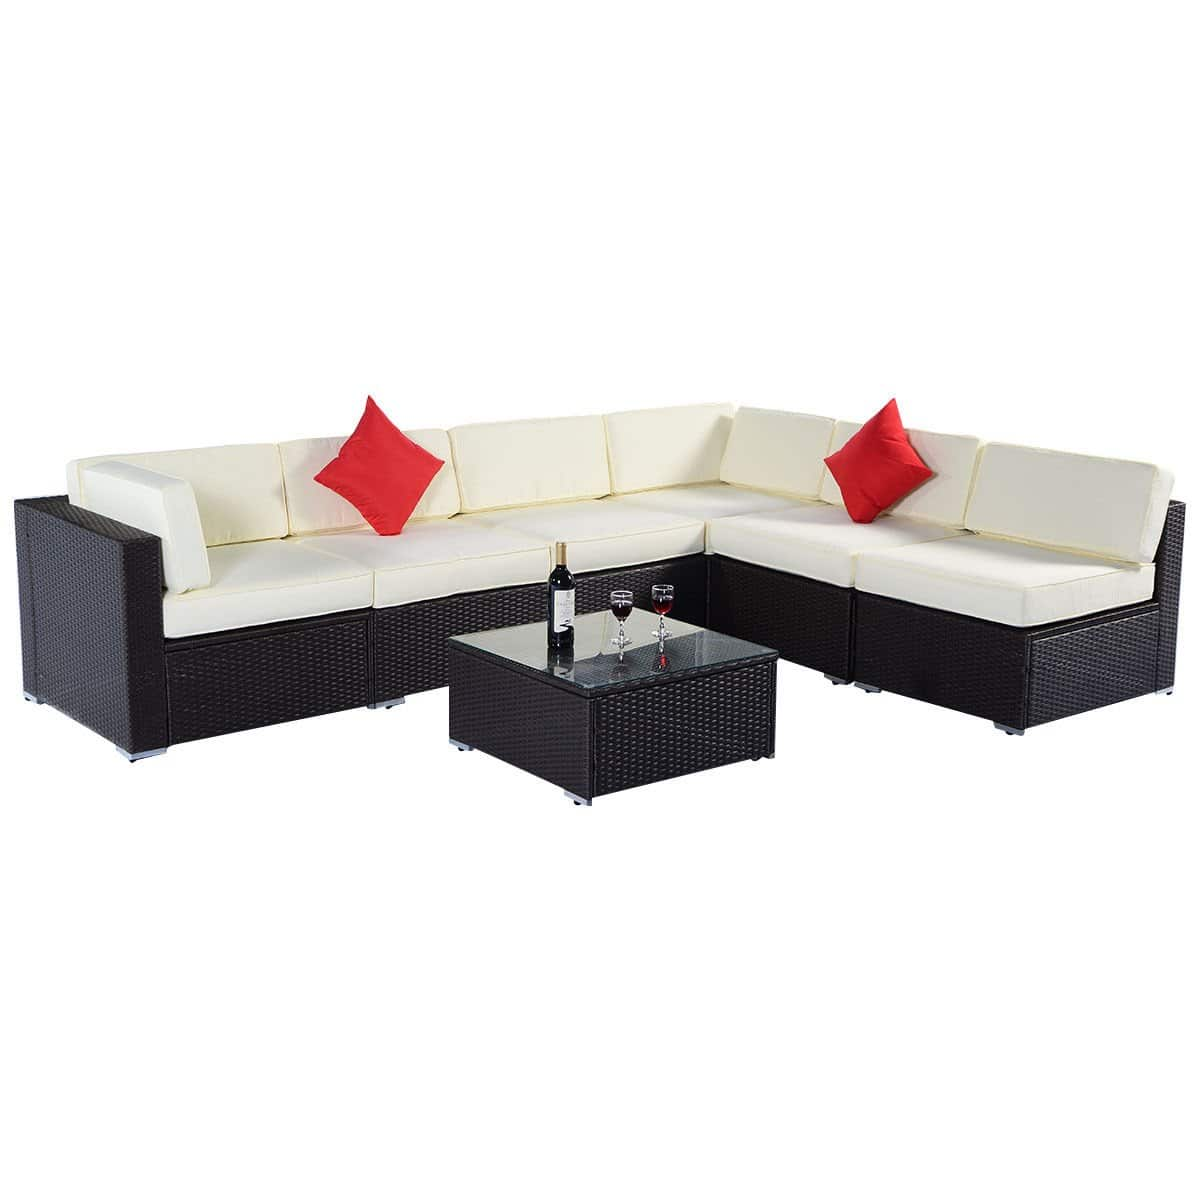 sectional sofa deals free shipping tara 53 bed costway 7pc wicker patio set 529 99 a c